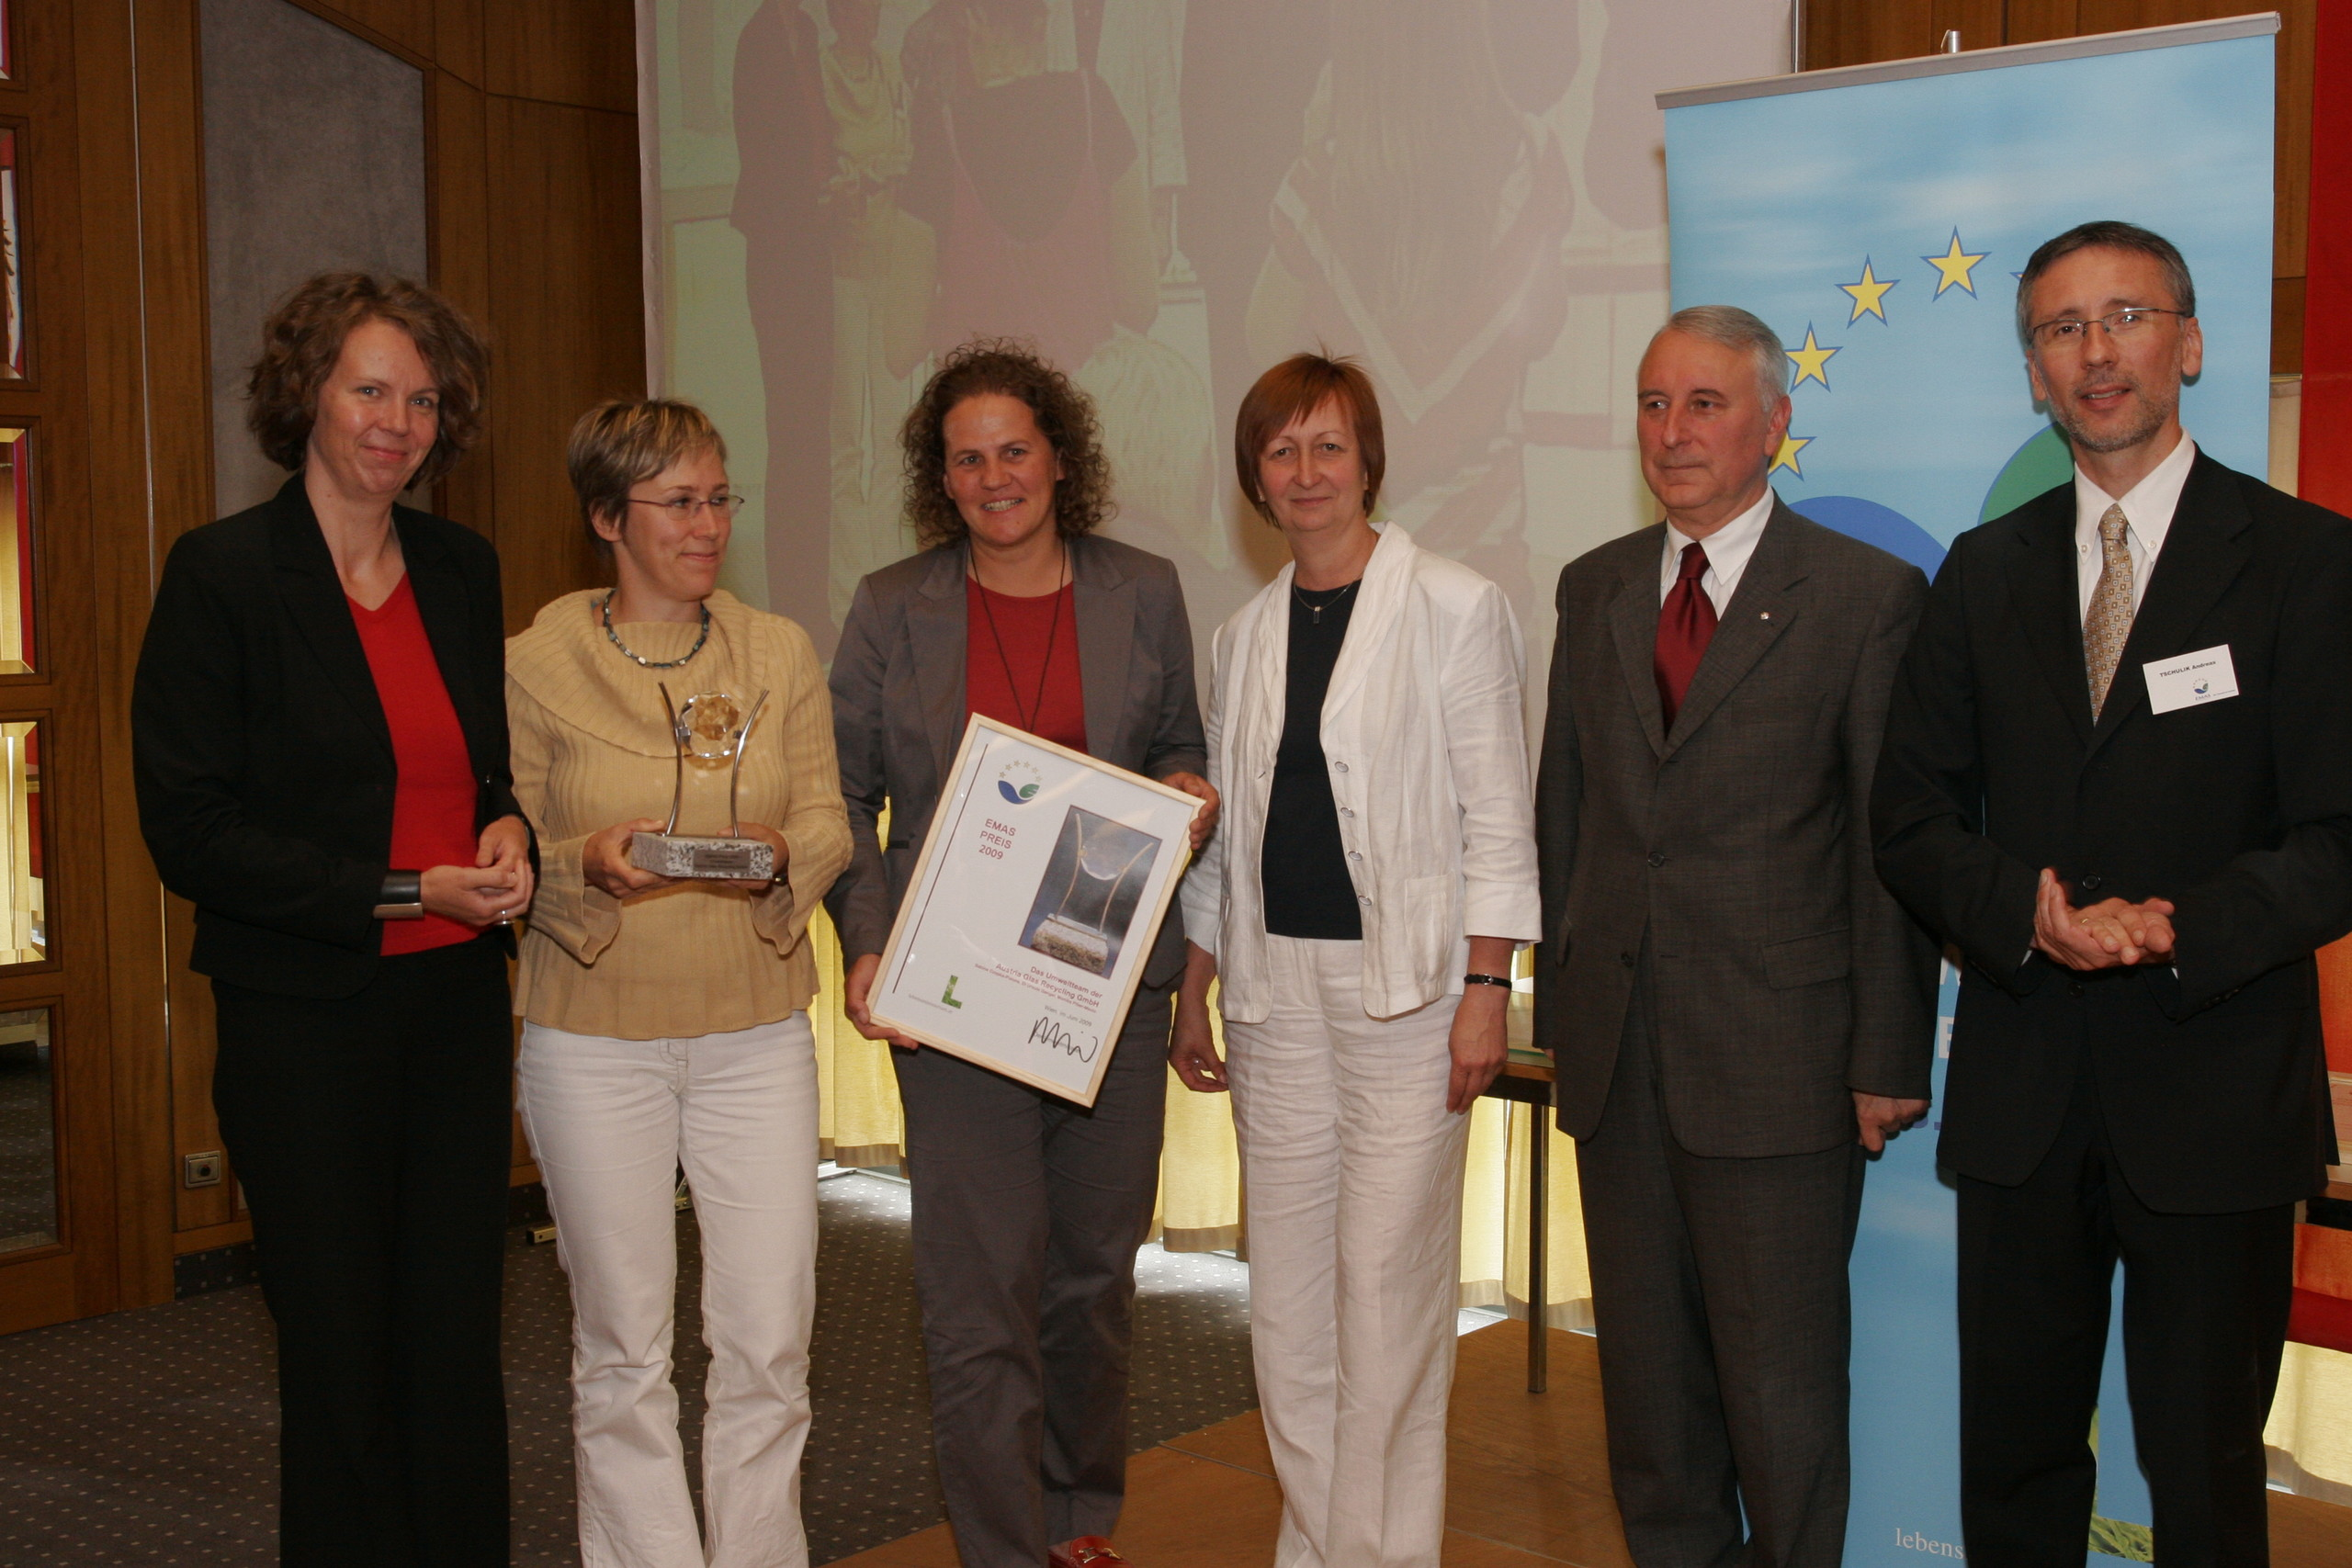 ASRA 2008 für Austria Glas Recycling, (v.l.n.r.: Dr. Wolfram Tertschnig/Lebensministerium, Dr. Christine Jasch/Jury-Vorsitzende ASRA, DI Ursula Gangel/AGR, Monika Piber-Maslo/AGR, Sabine Czopka-Pistora/AGR, KR Mag. Helmut Puffer/Vizepräsident der Kammer